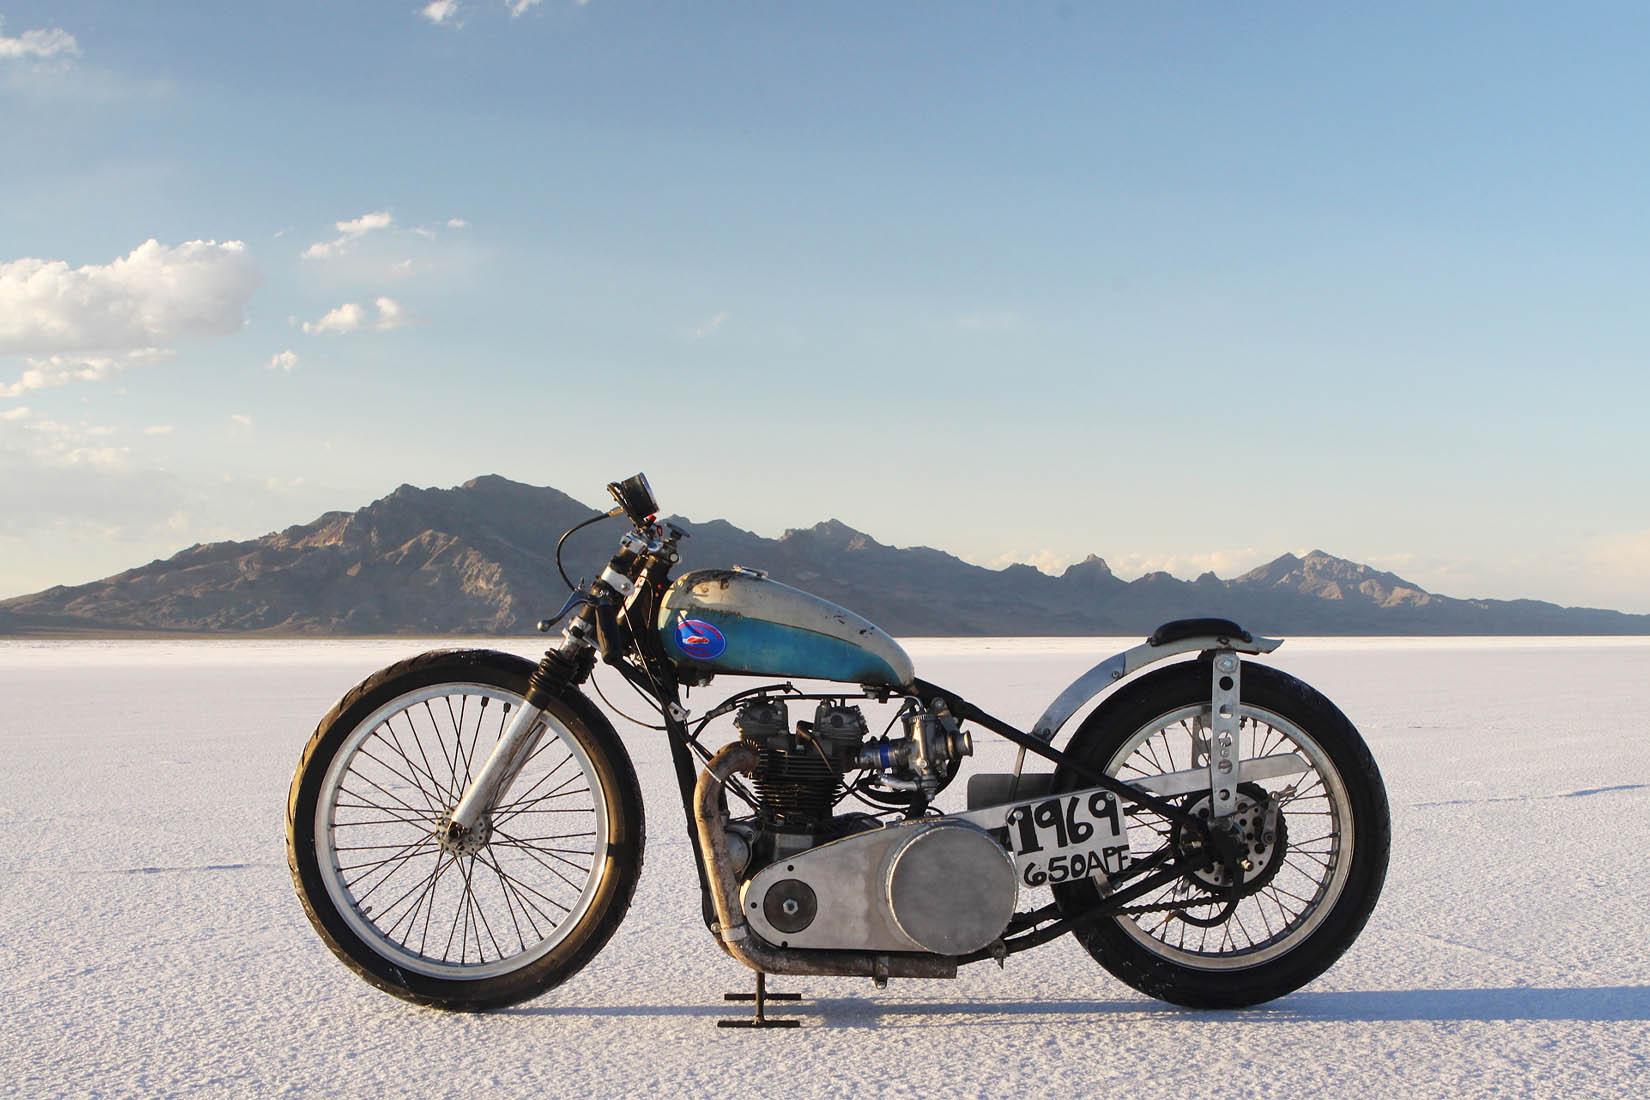 best custom motorcycle builder lowbrow customs review Luxe Digital